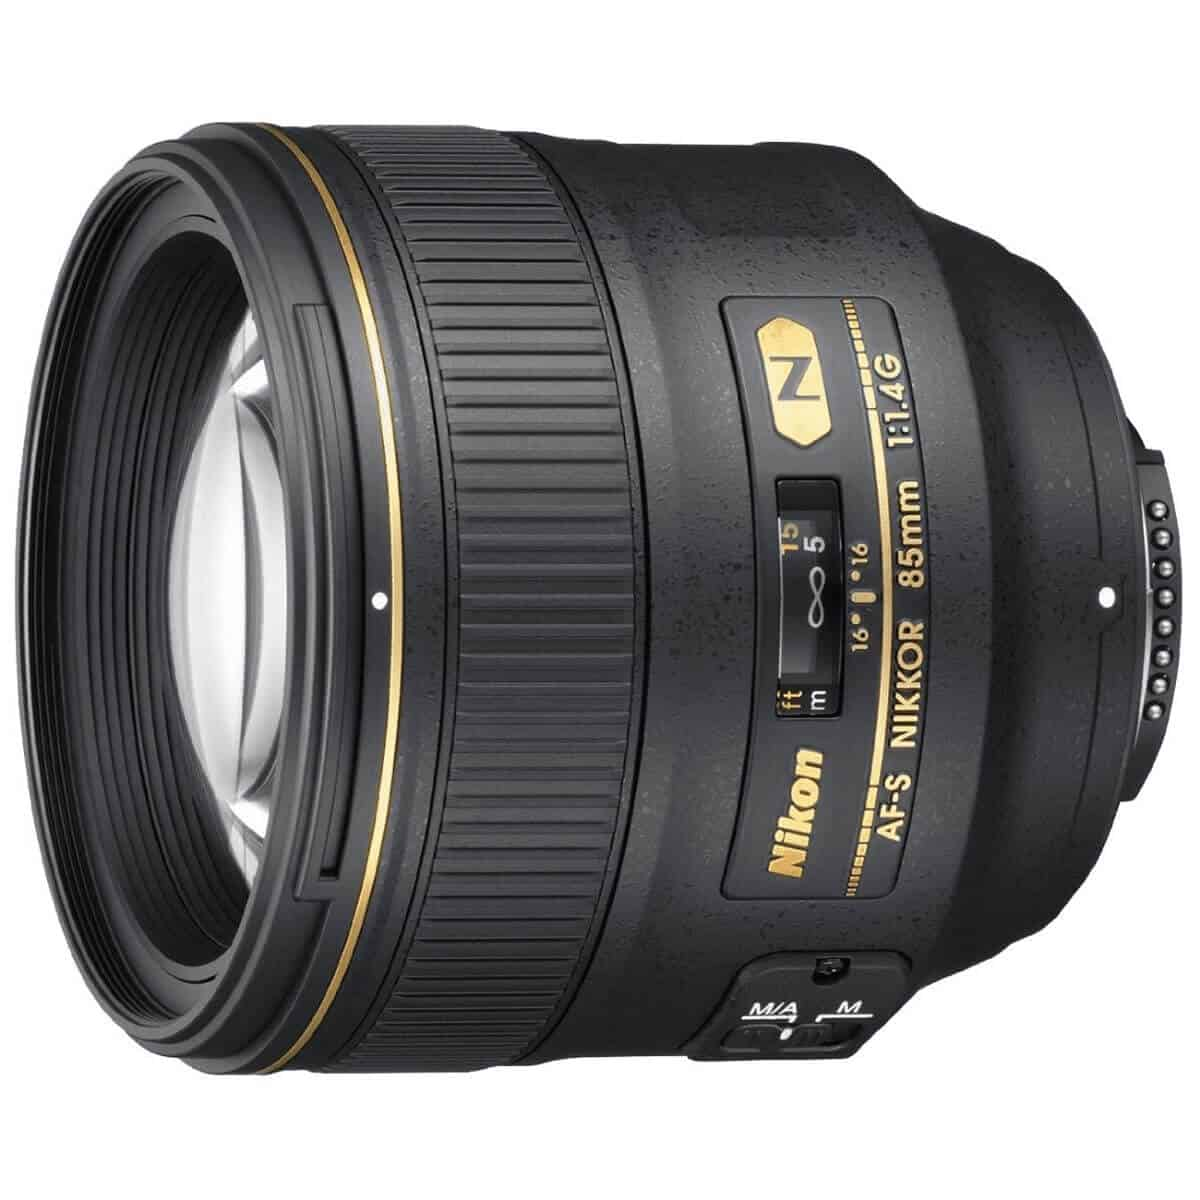 Nikon 85mm lens.